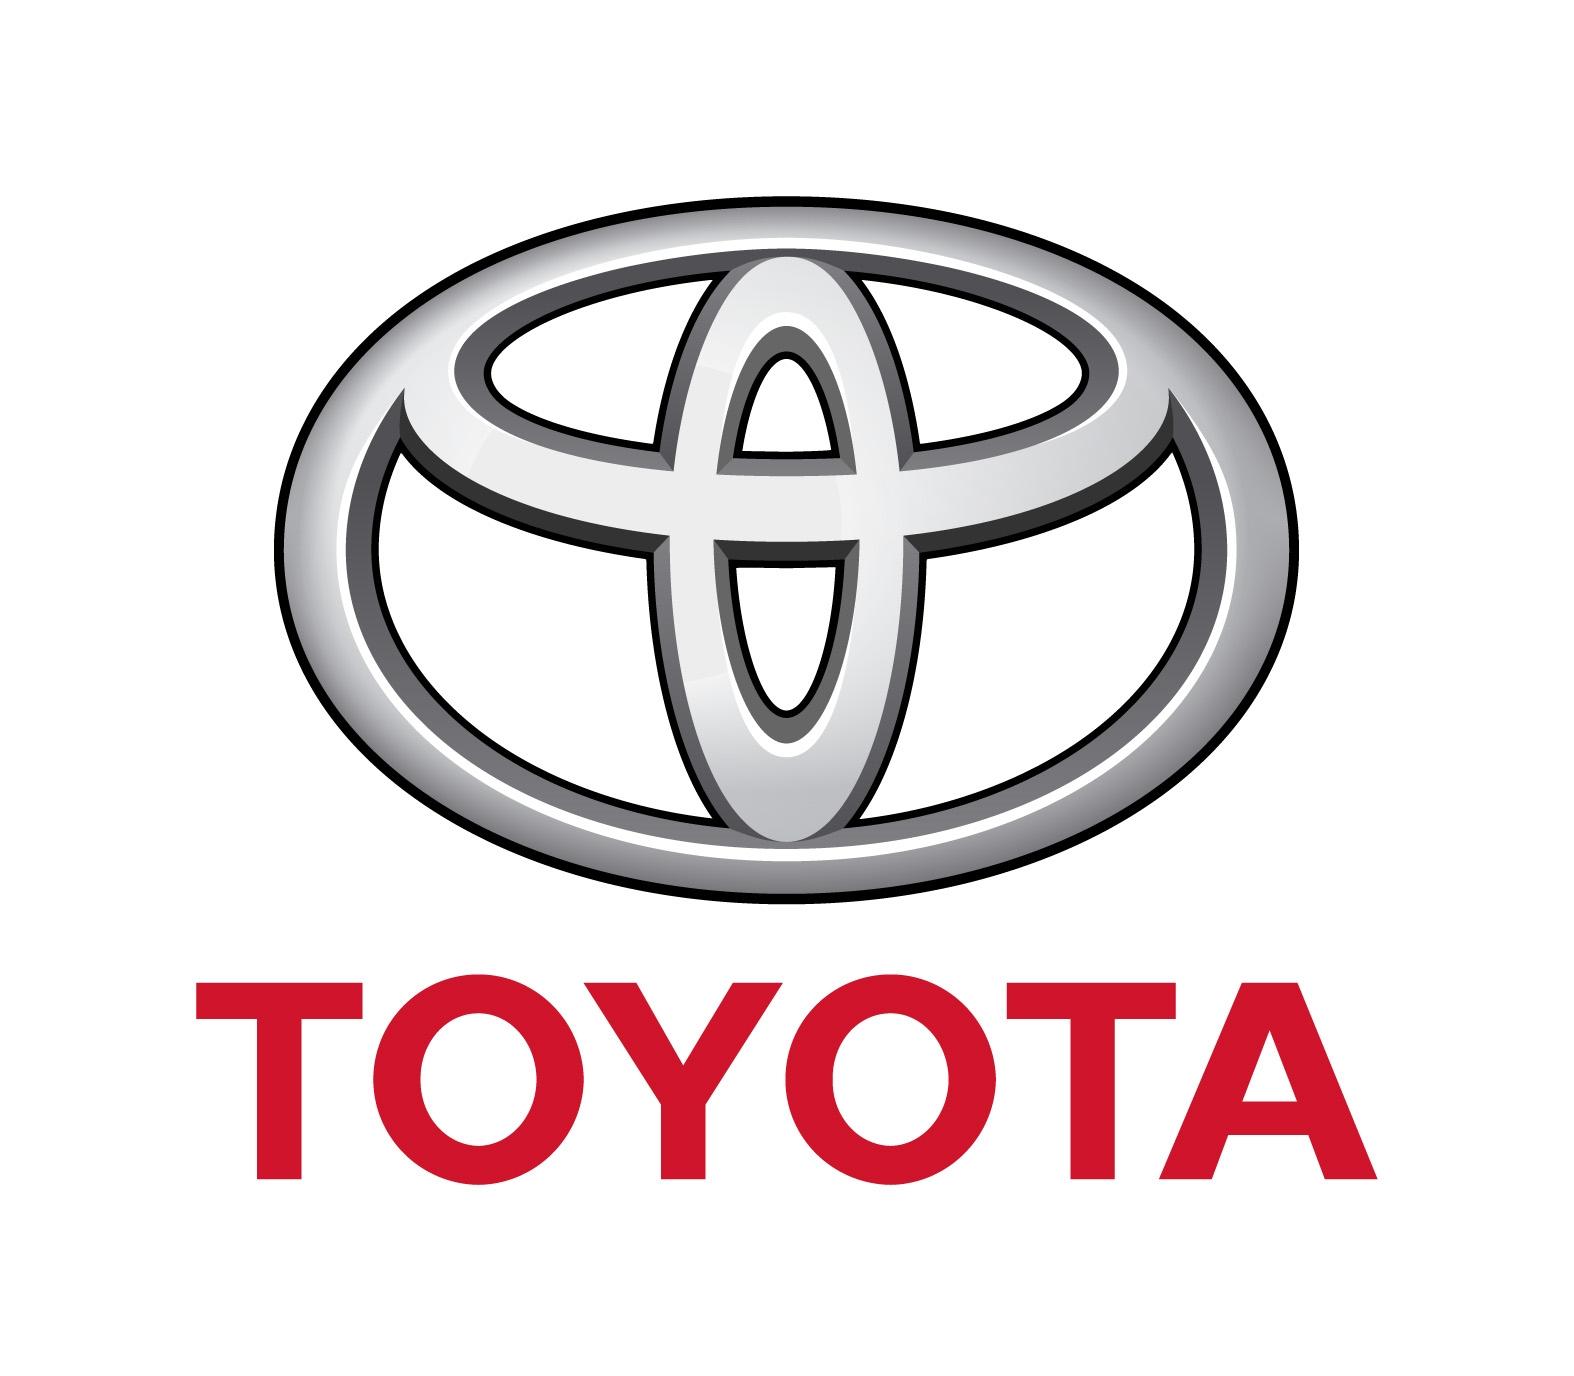 Japanese-car-brands-Toyota-logo.jpg